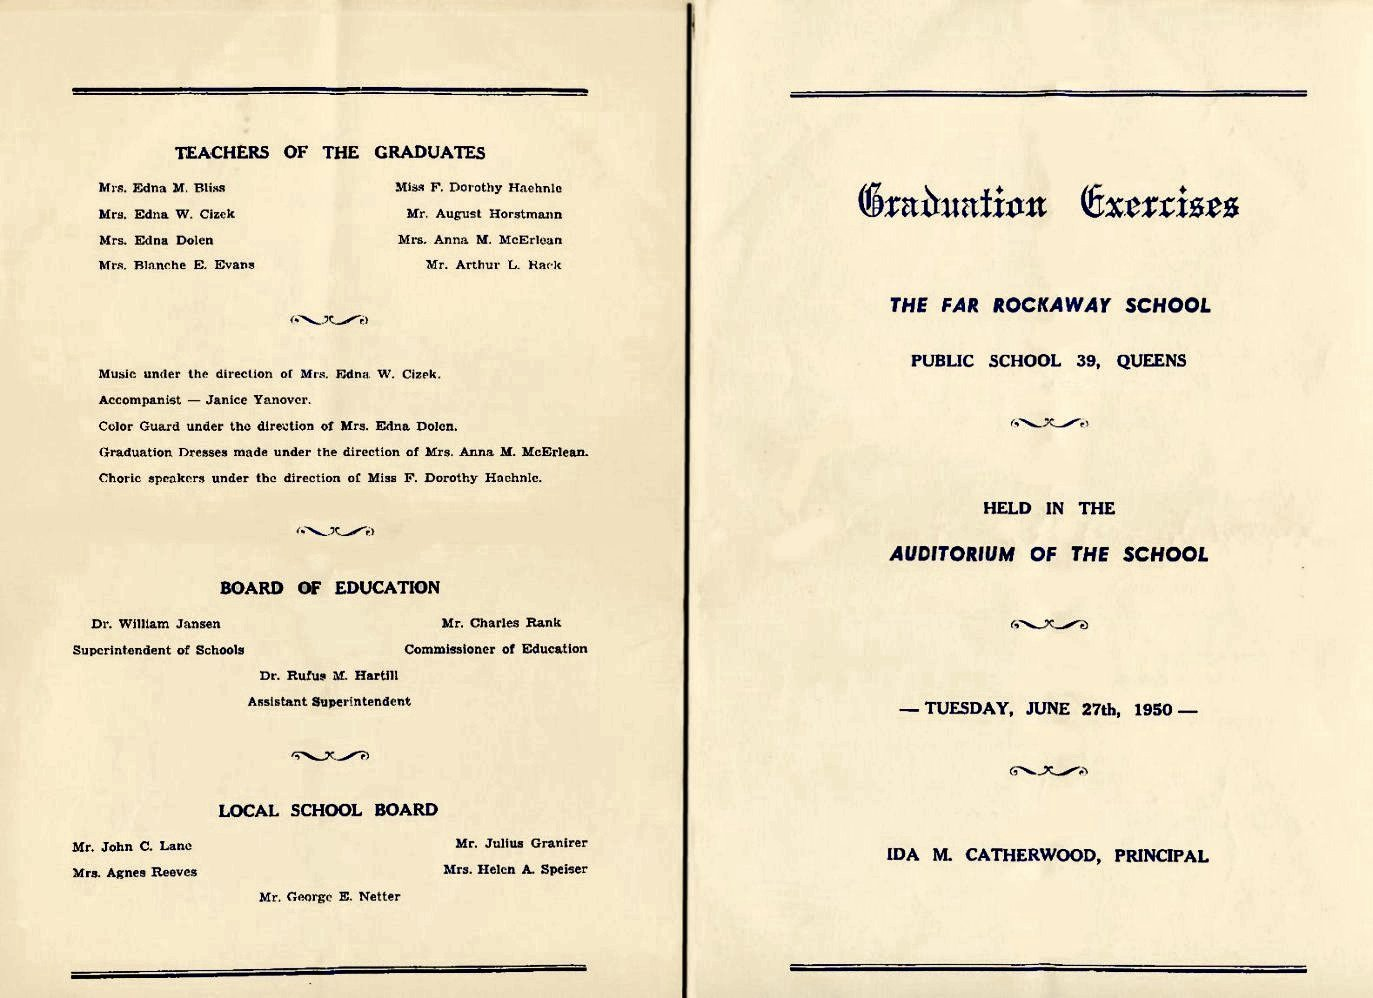 Graduation Ceremony Program Template Beautiful Program Samples for Graduation